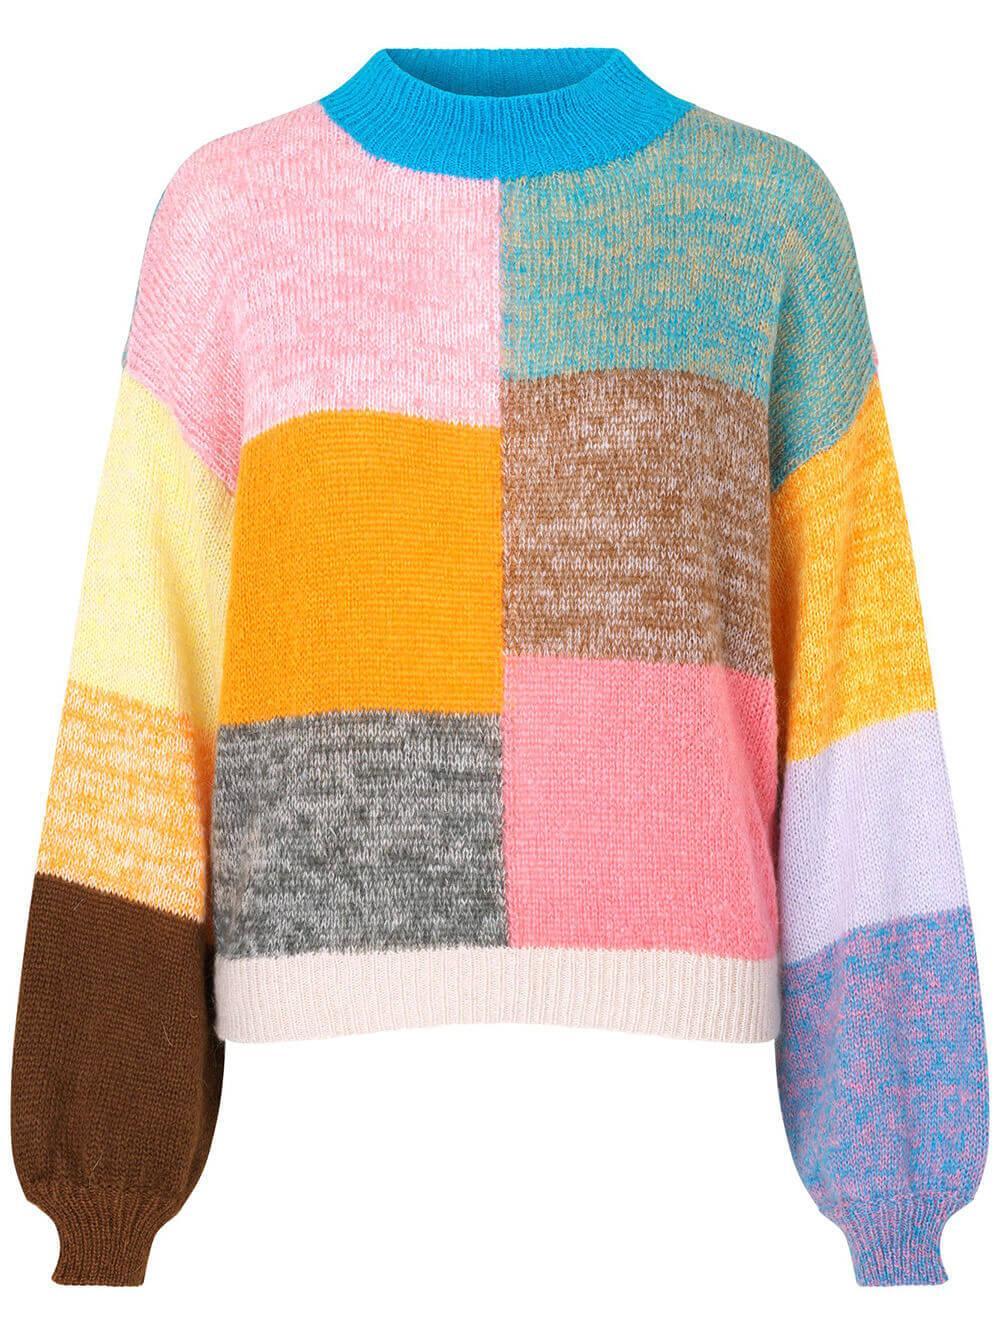 Adonis Sweater